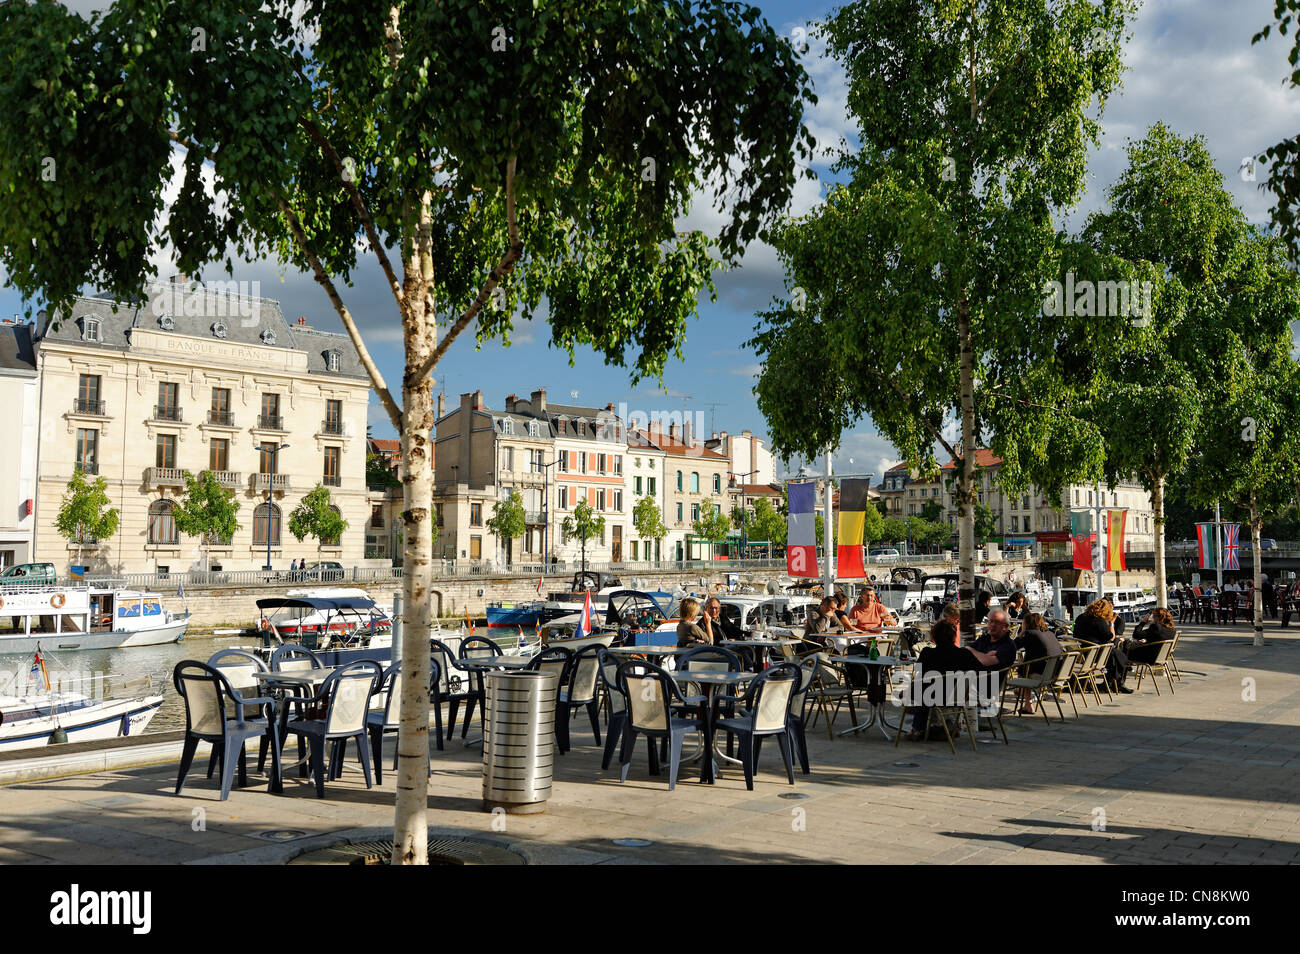 France, Meuse, Verdun, Quai de Londres, sidewalk cafe on a pedestrian walkway along the Meuse river, consumers sitting - Stock Image